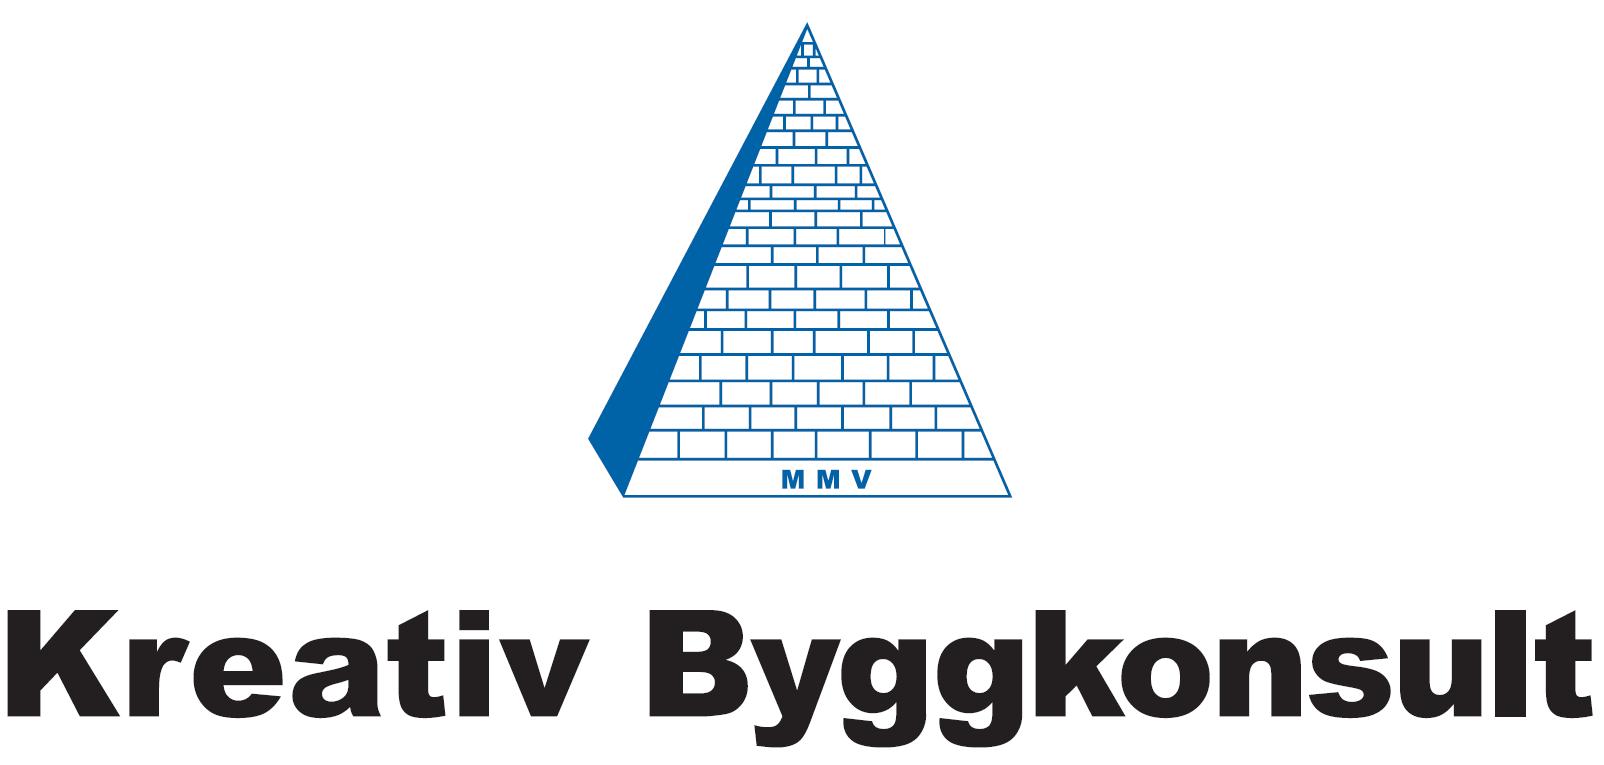 Kreativ Byggkonsult i Stockholm